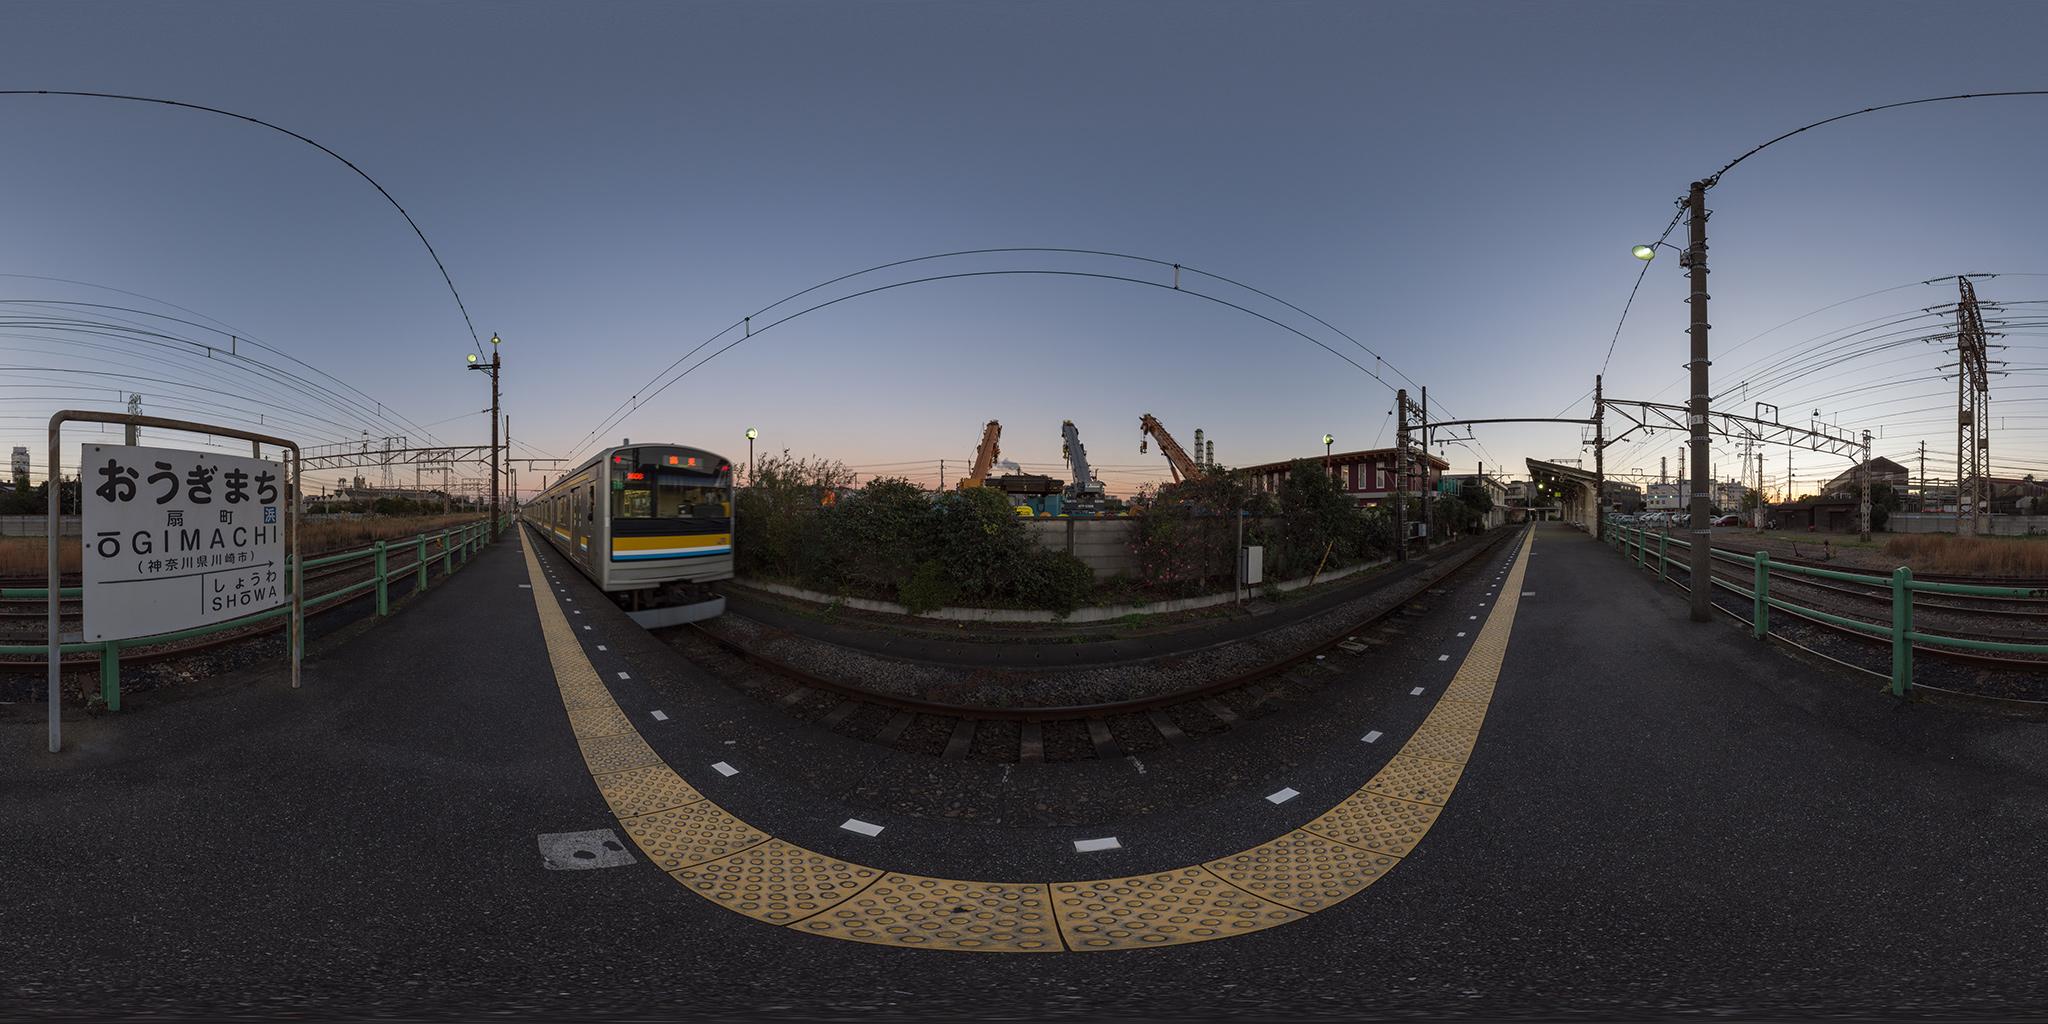 鶴見線の終着駅、扇町駅